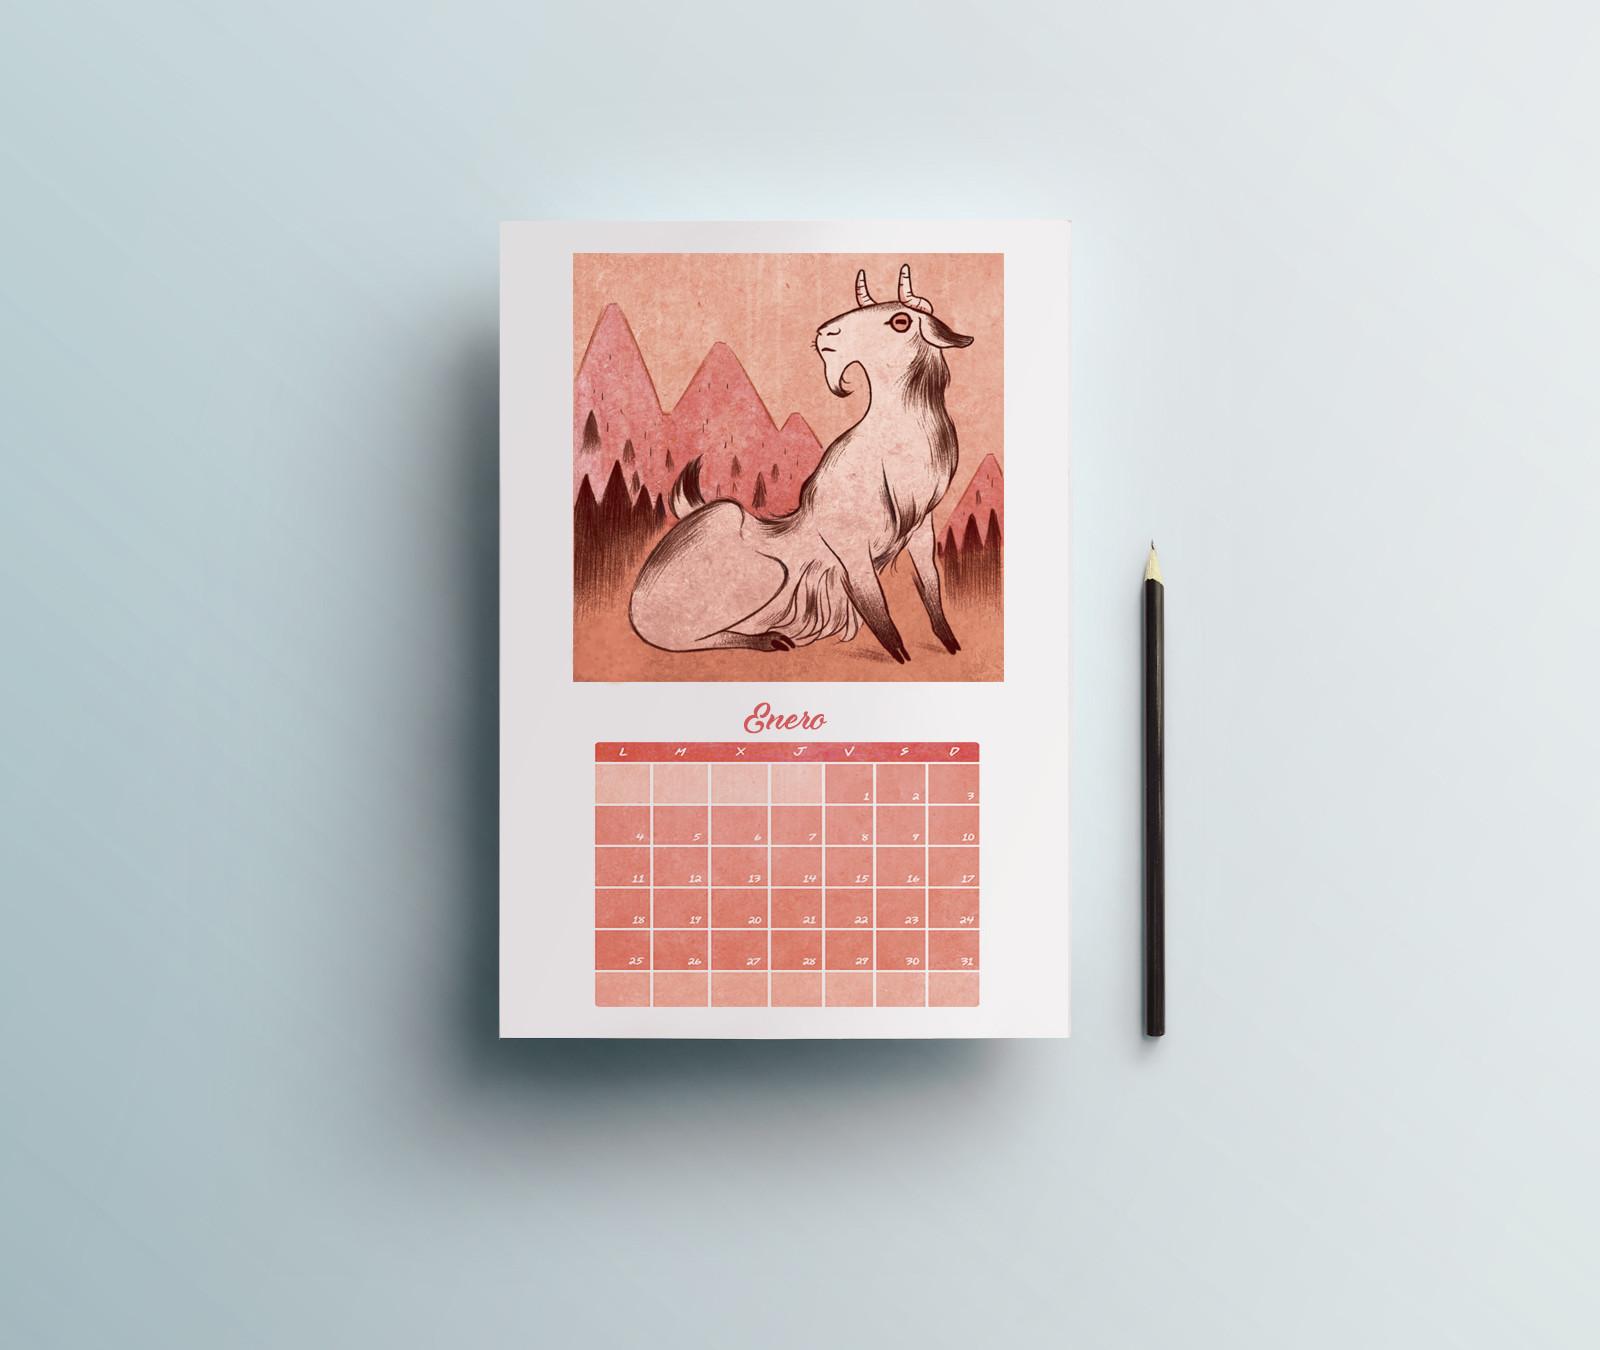 Sara ruiz prado calendario imprimir mockup vol 1